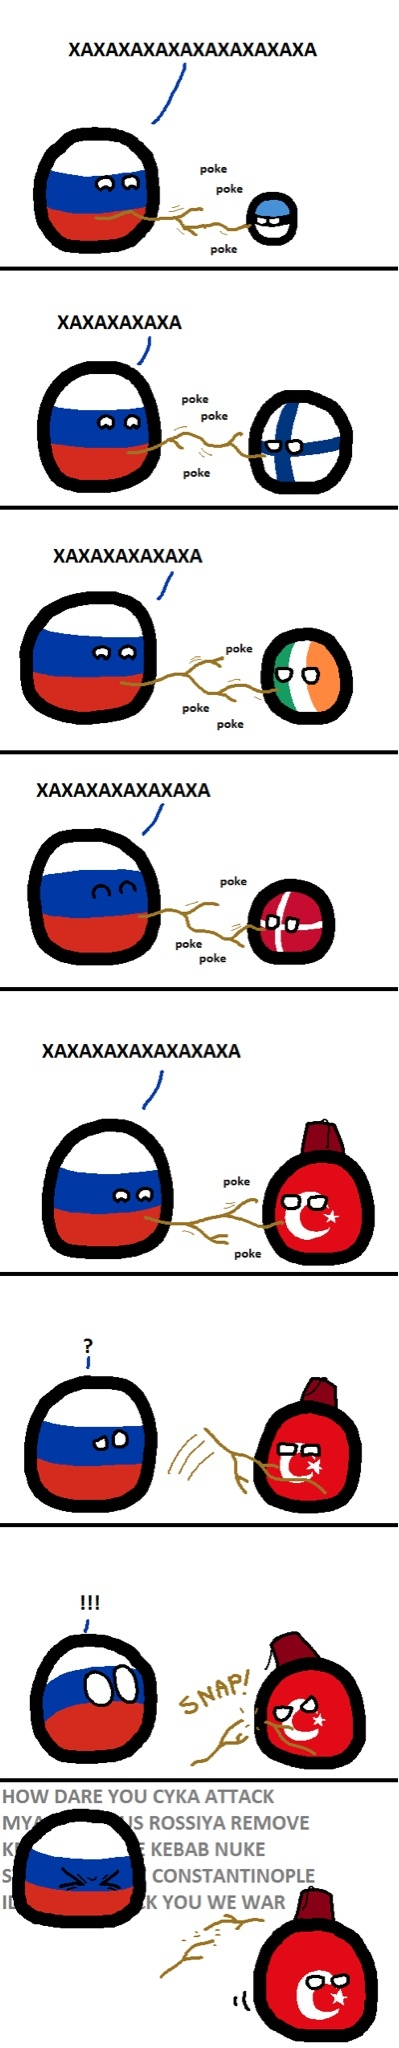 Turkey and Russia - meme